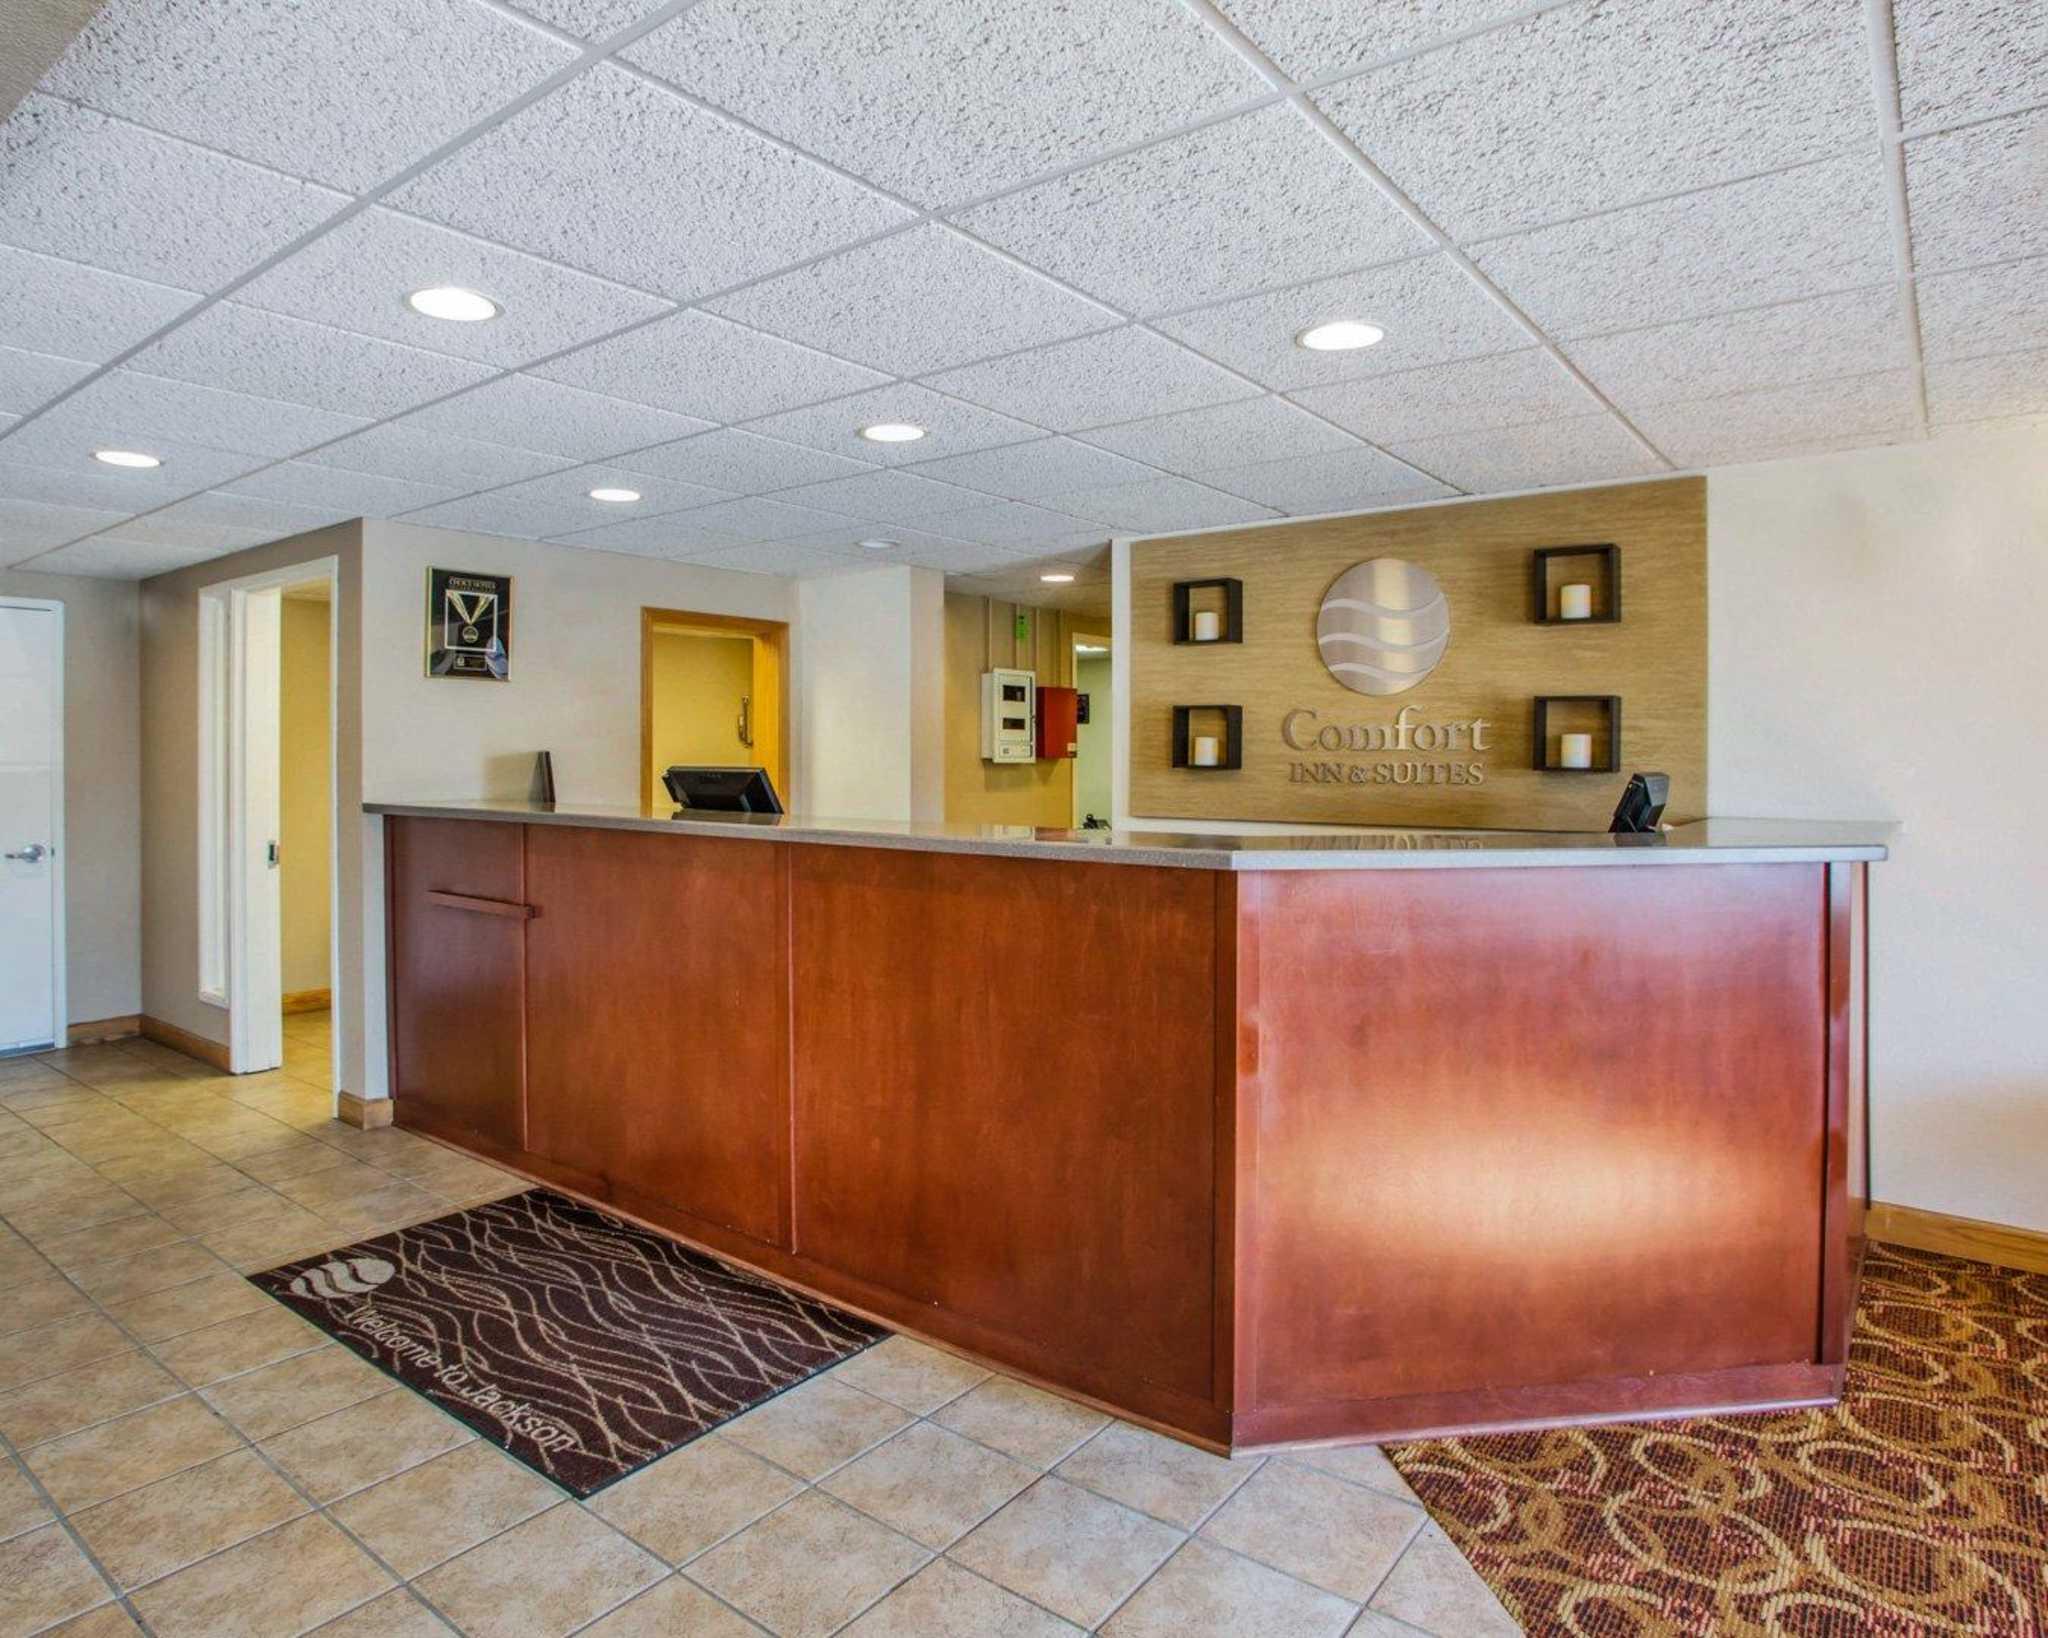 Comfort Inn & Suites Jackson - West Bend image 20